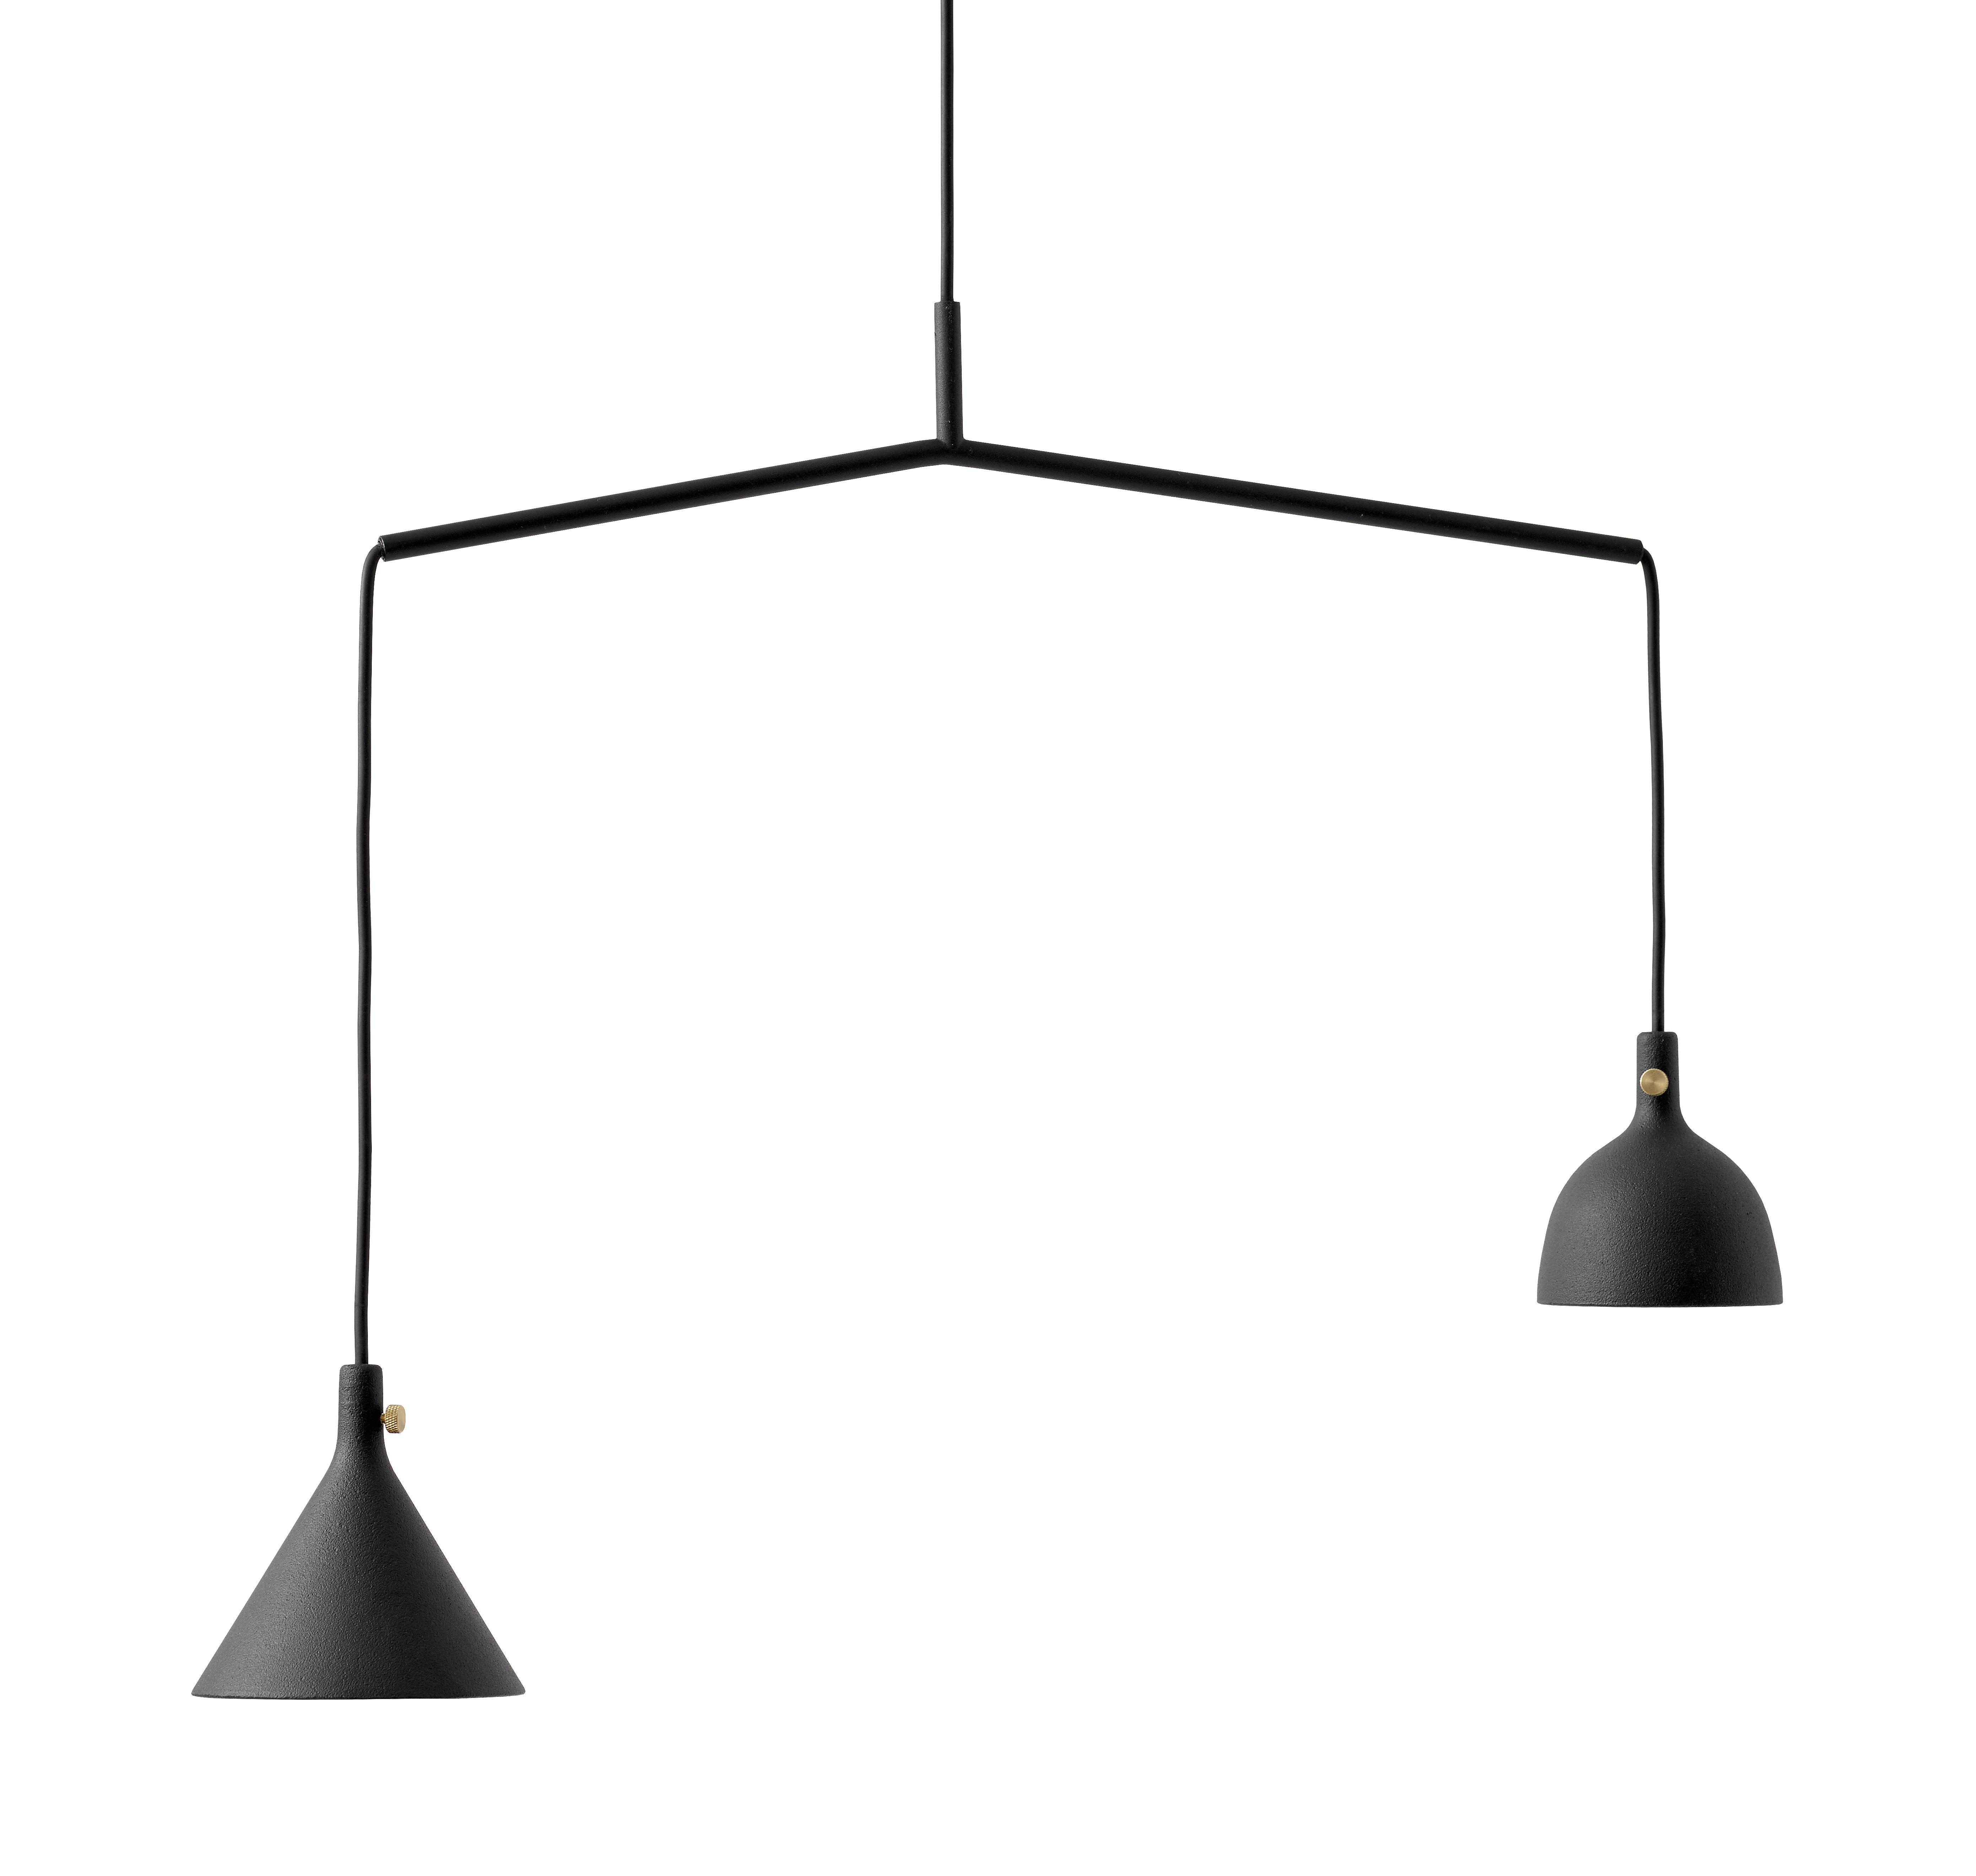 Illuminazione - Lampadari - Sospensione Cast n°4 / 2 paralumi - L 56 cm - Menu - Nero - Ghisa di alluminio